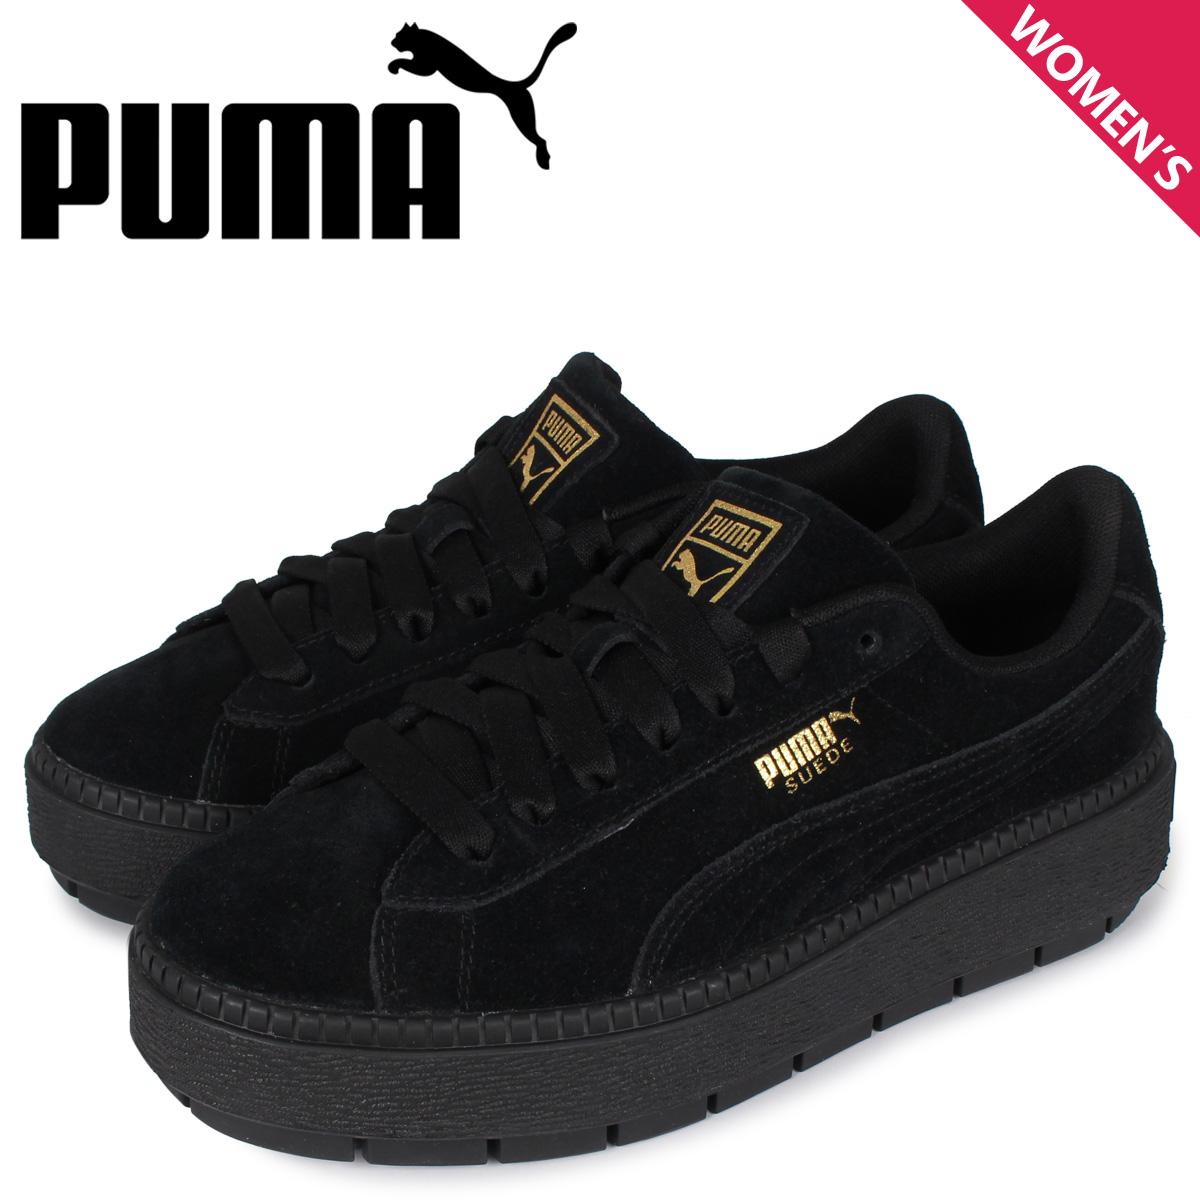 PUMA プーマ スエード プラットフォーム スニーカー レディース スウェード 厚底 SUEDE PLATFORM TRACE WMNS ブラック 黒 36583001